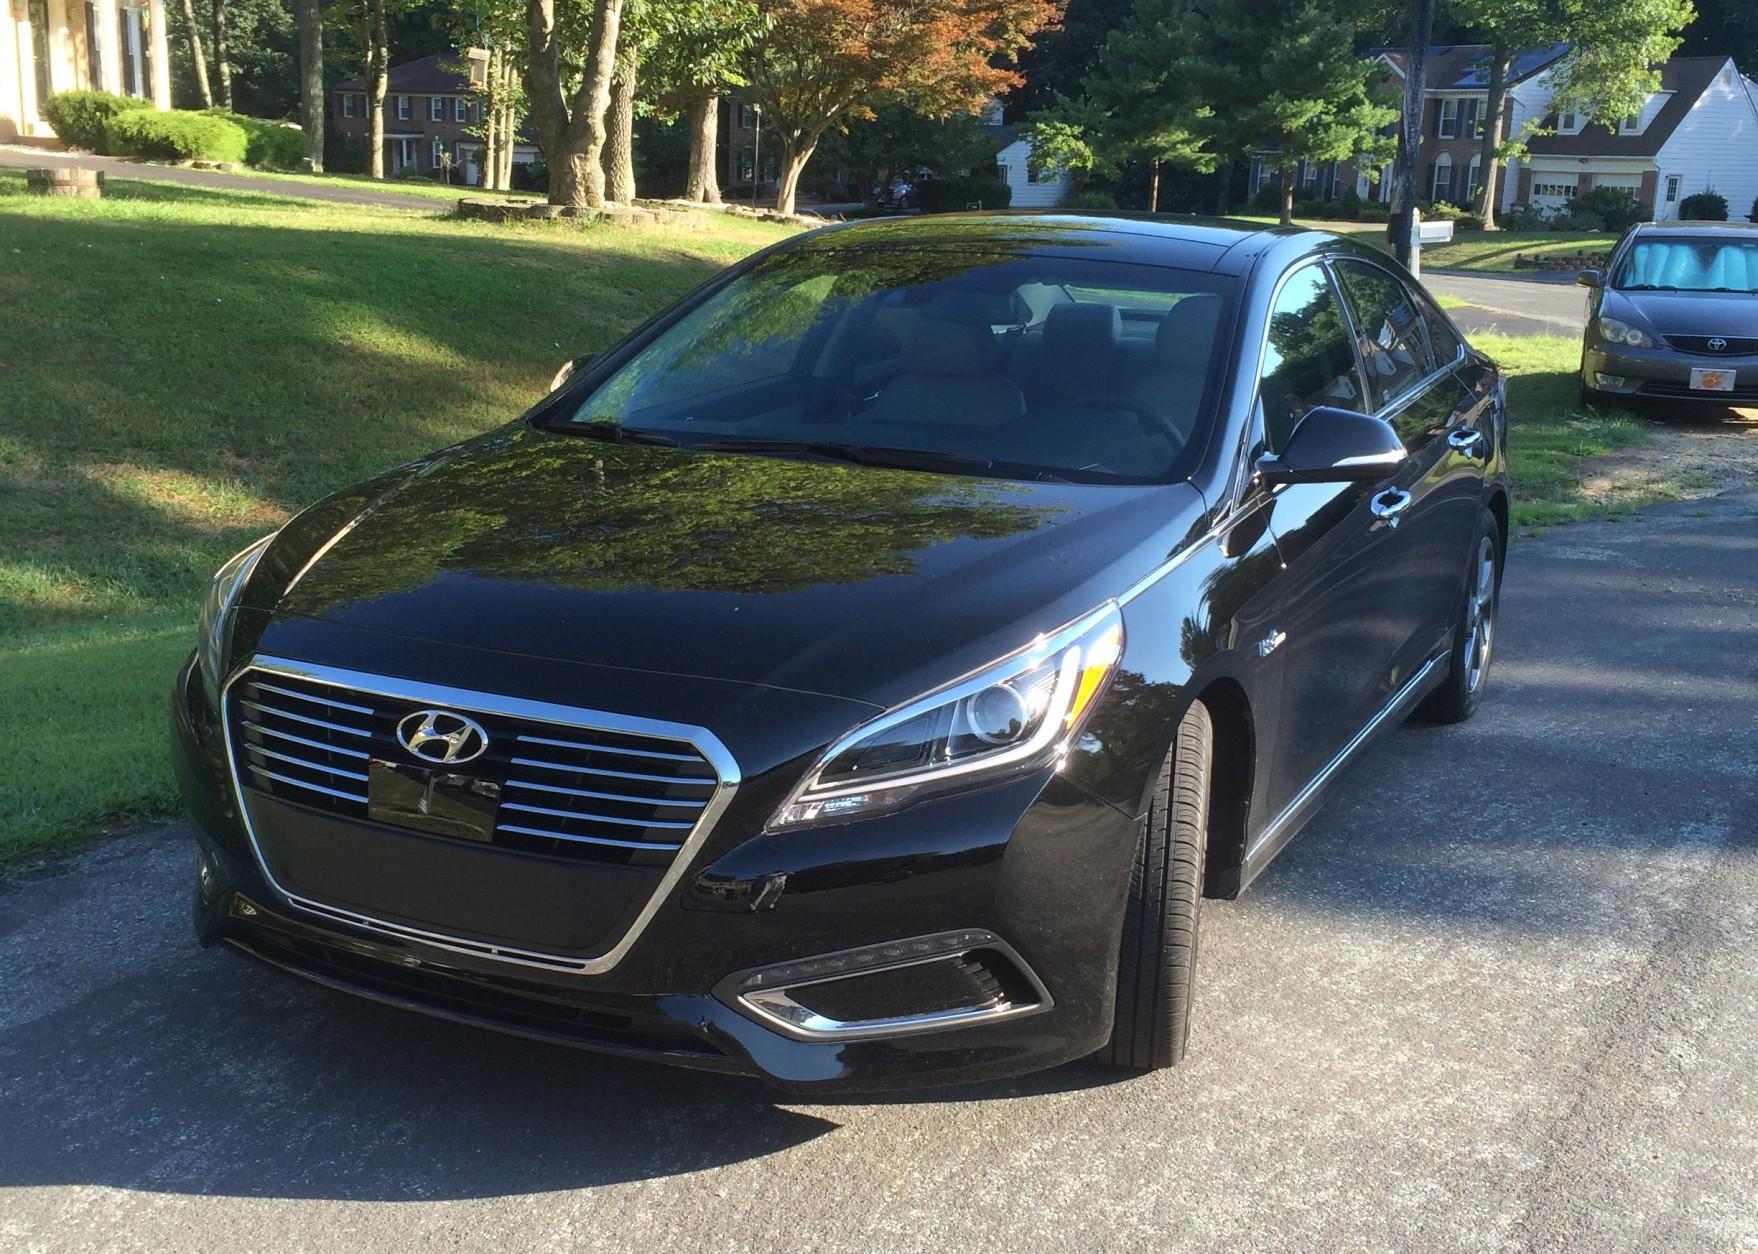 Hyundai Sonata Mpg >> 2016 Hyundai Sonata Hybrid Mpg Luxury For A Decent Price